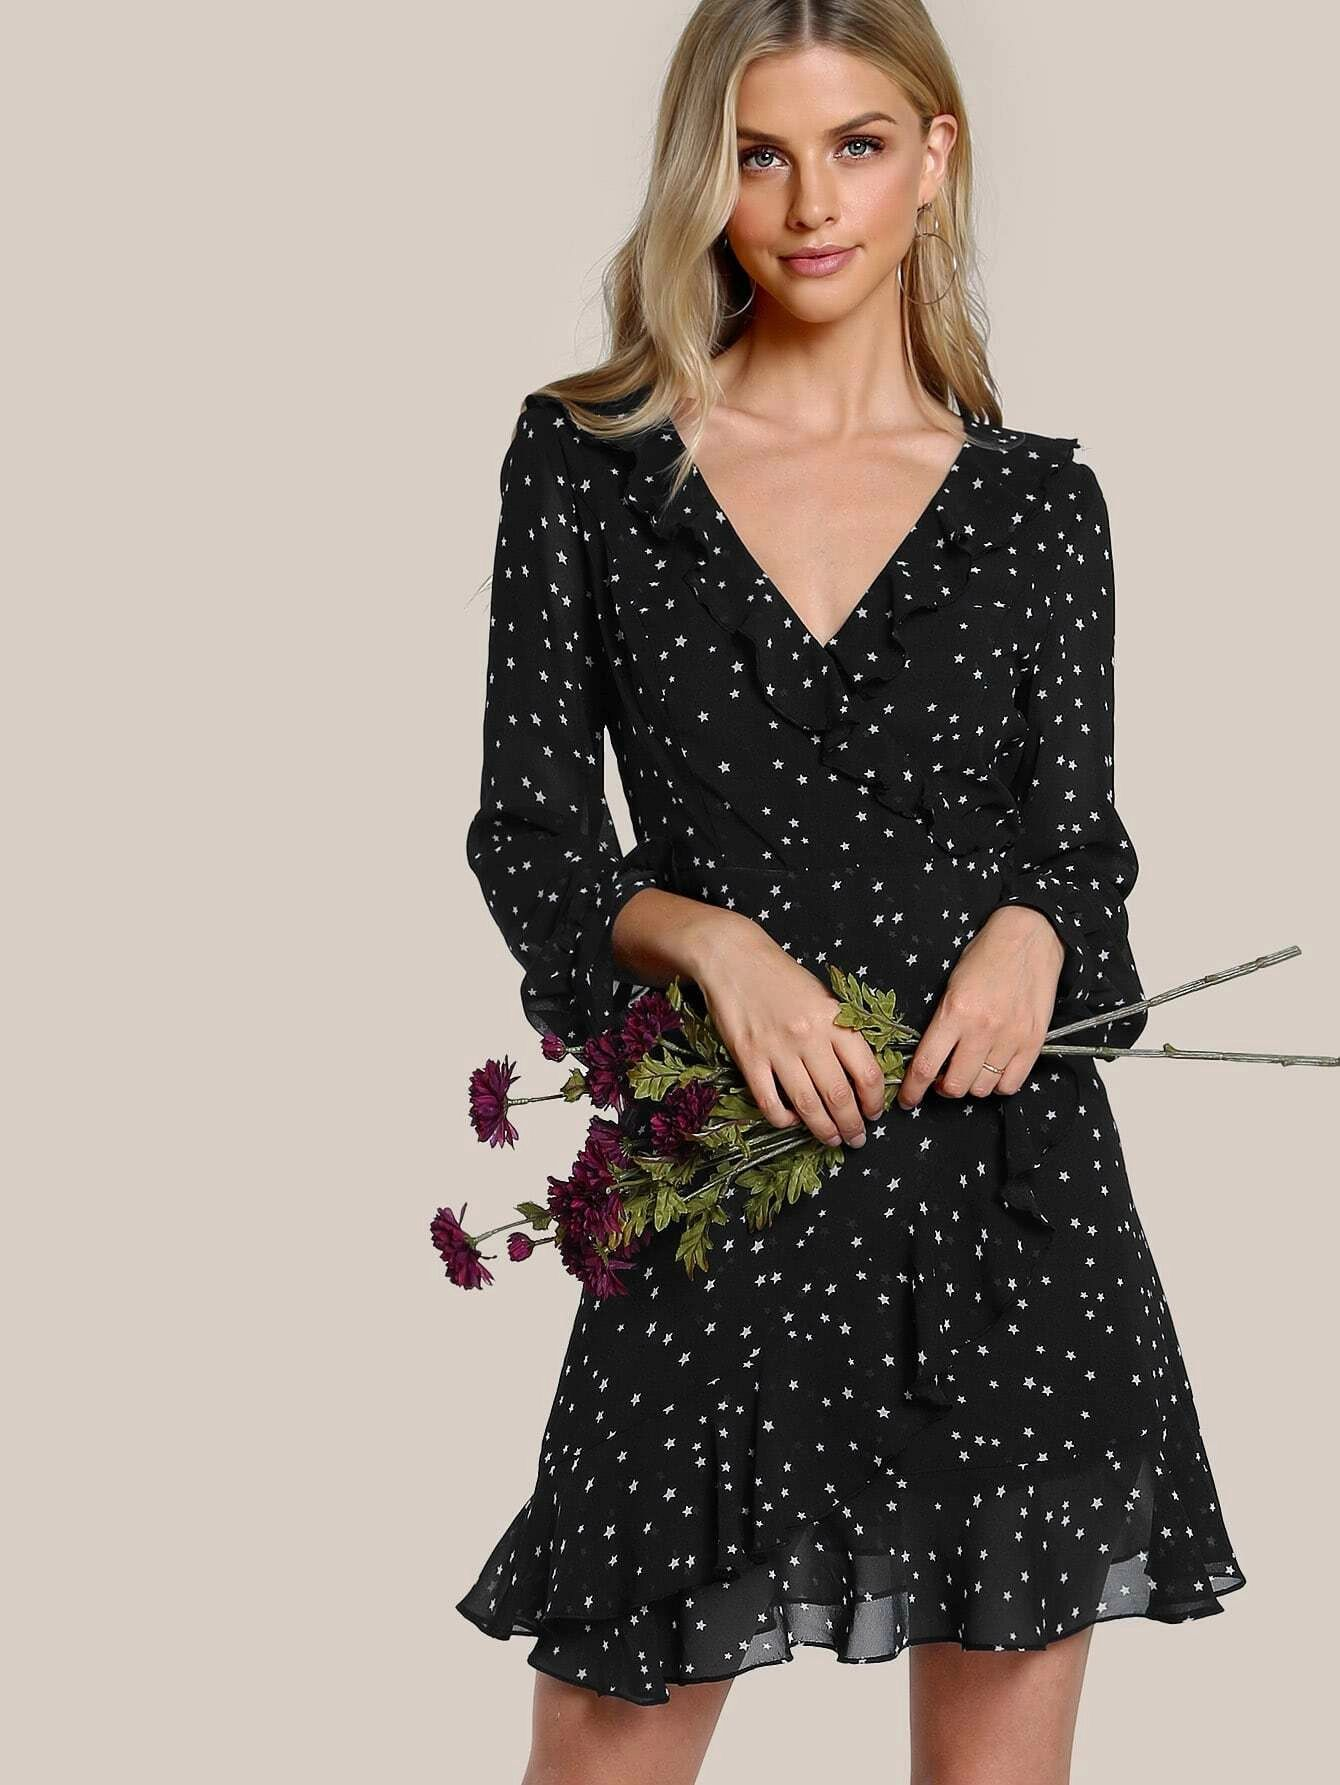 SHEIN Star Print Ruffle Wrap Dress